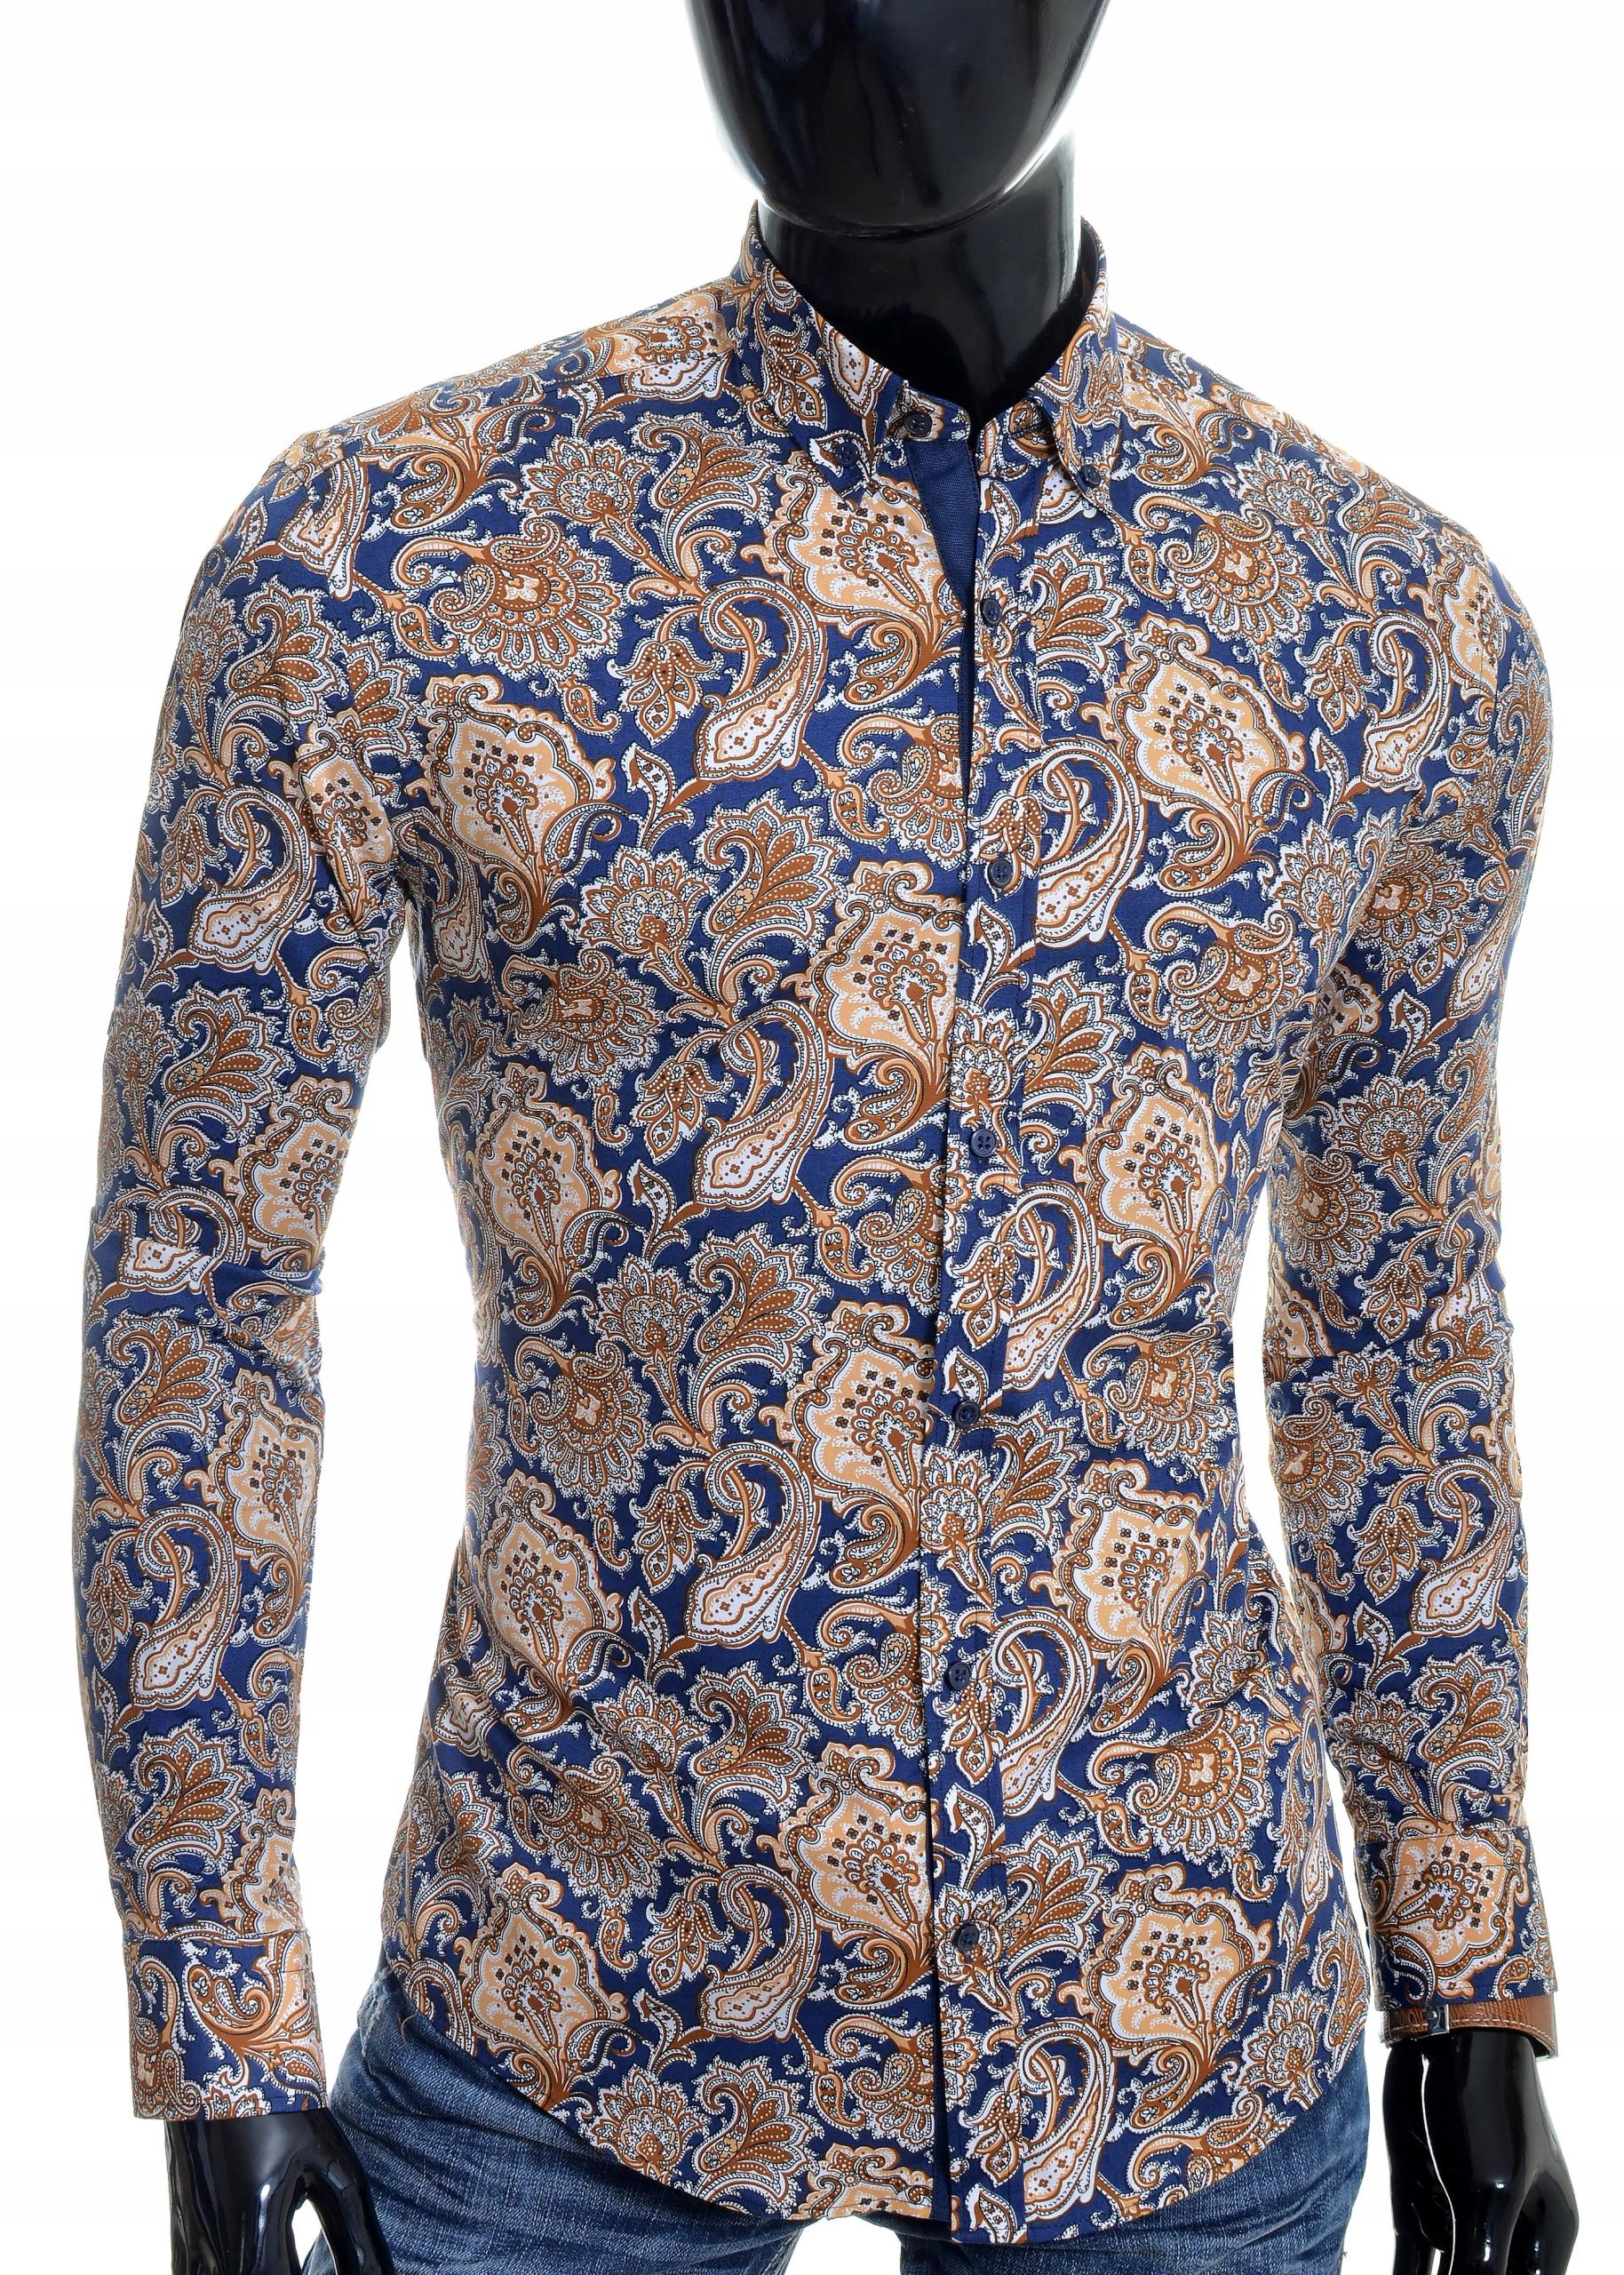 Koszula Męska Cipo Baxx Casual Elegancka NOWOŚĆ 7801908877